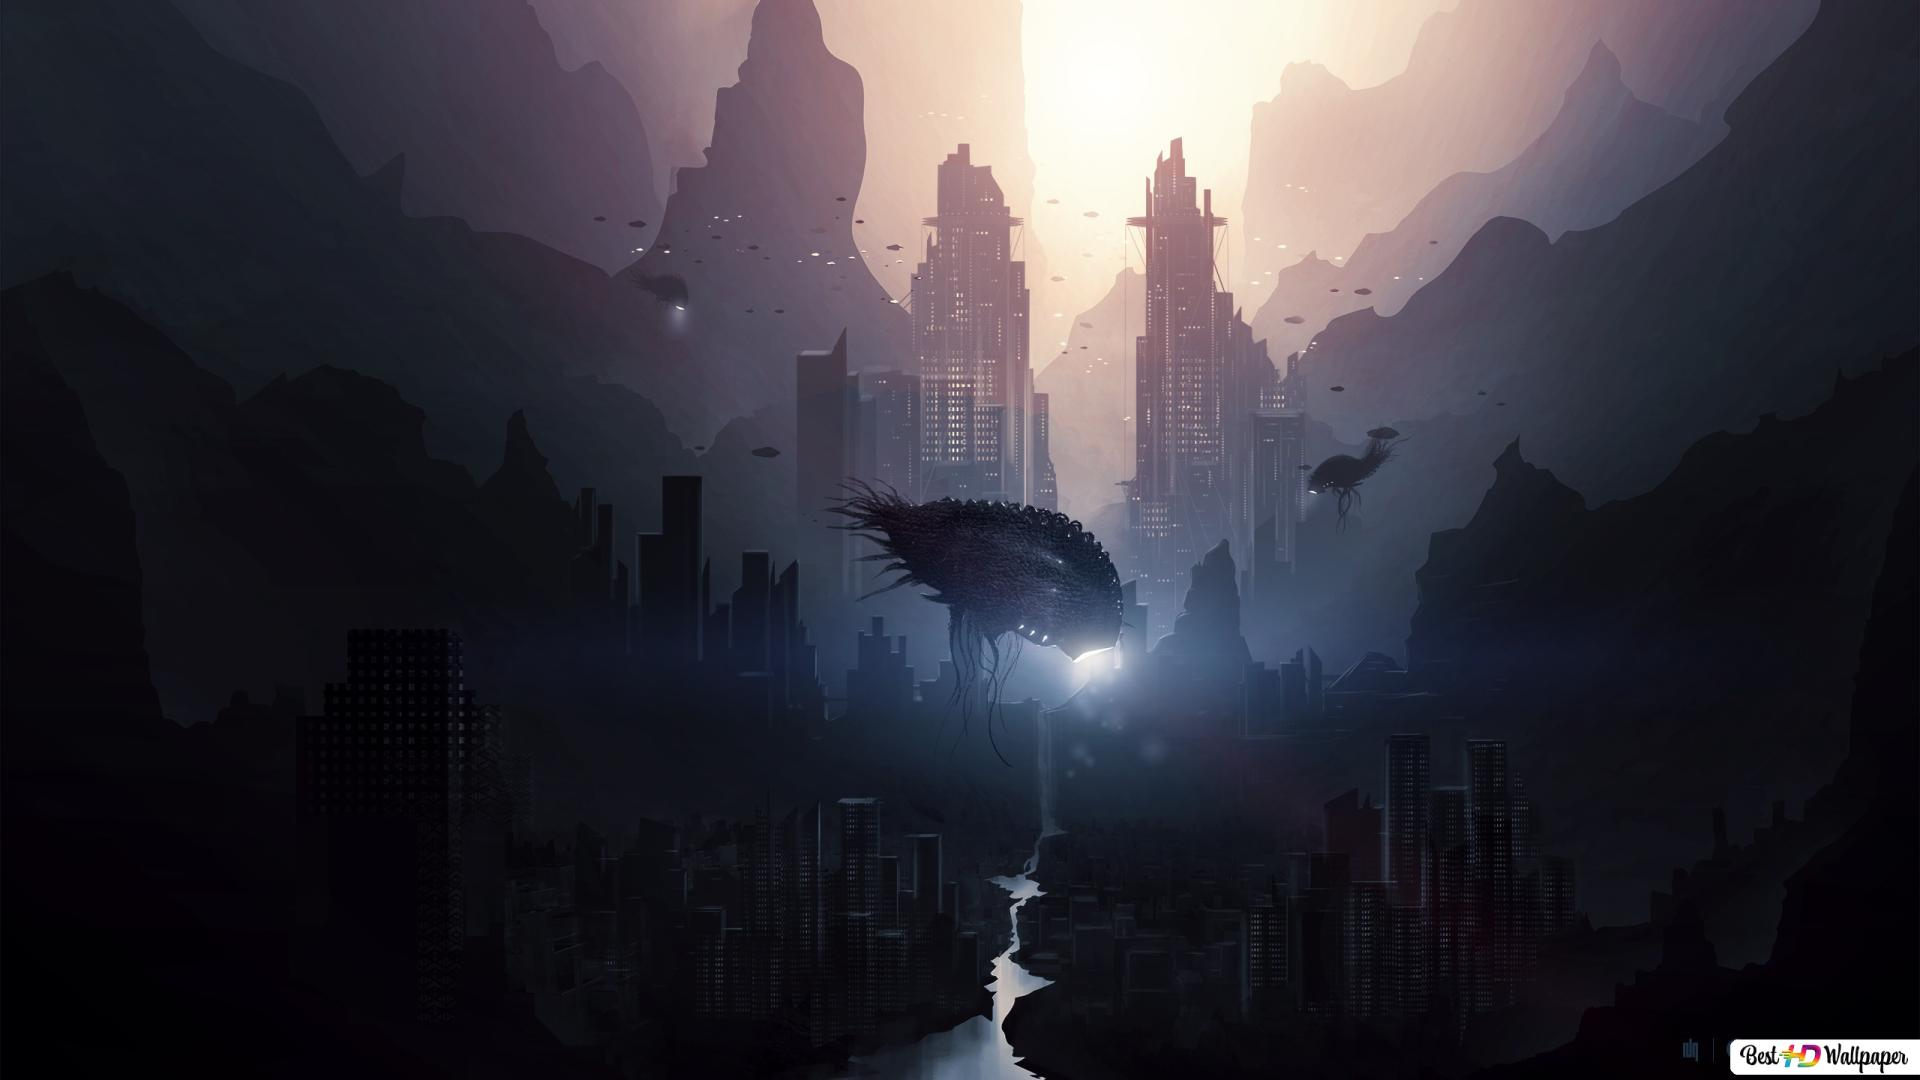 Invasion Extraterrestre Hd Fond D Ecran Telecharger